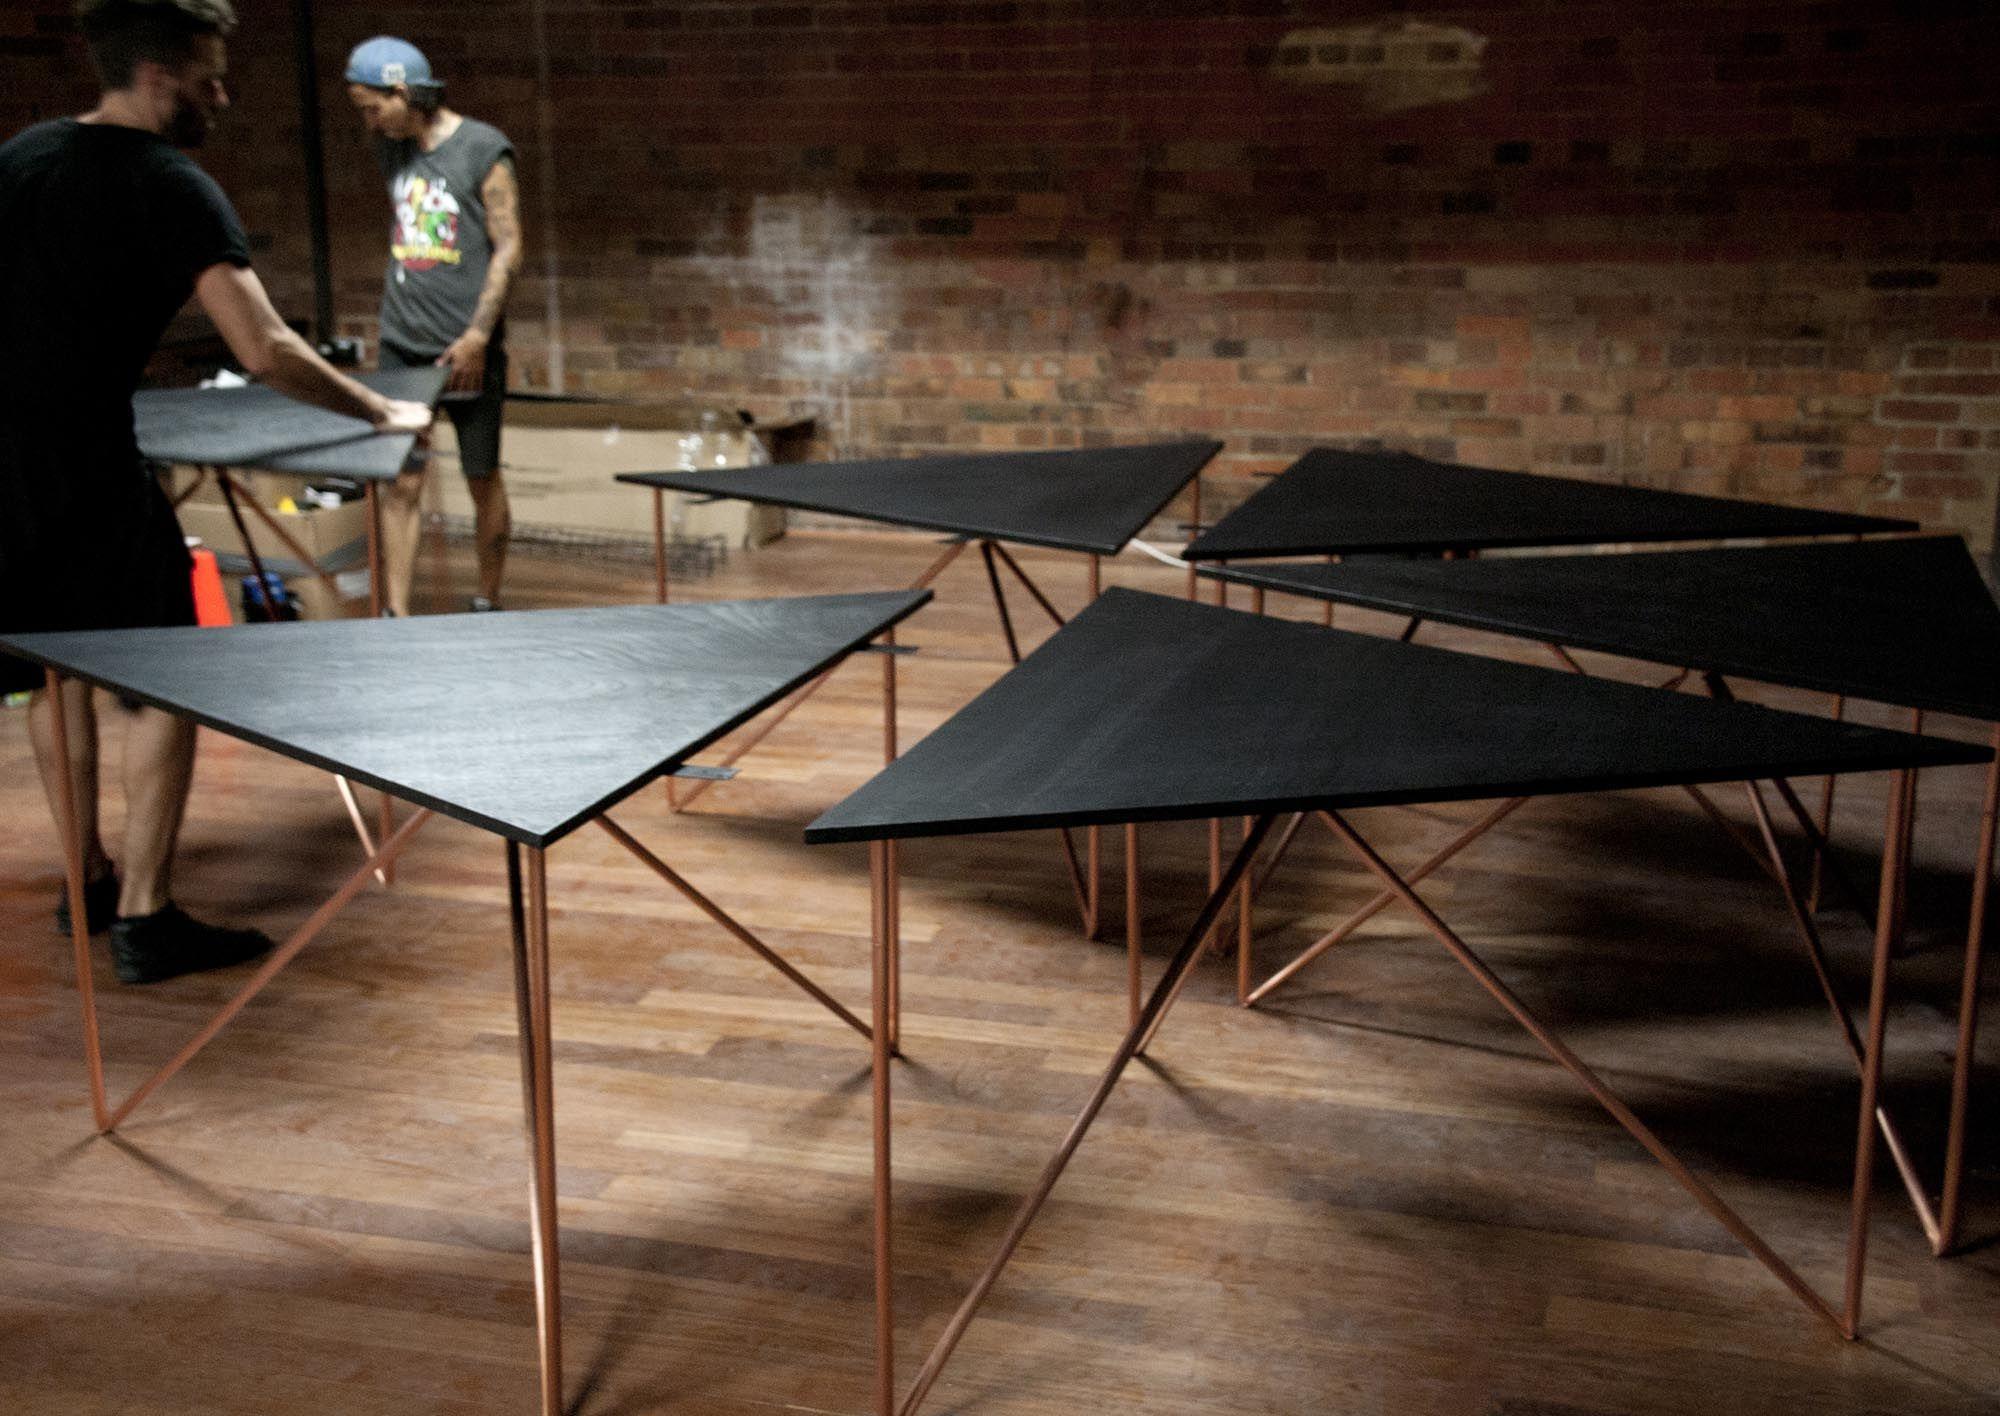 Conference Table Copper Legs Vincent Buret - Hexagon conference table